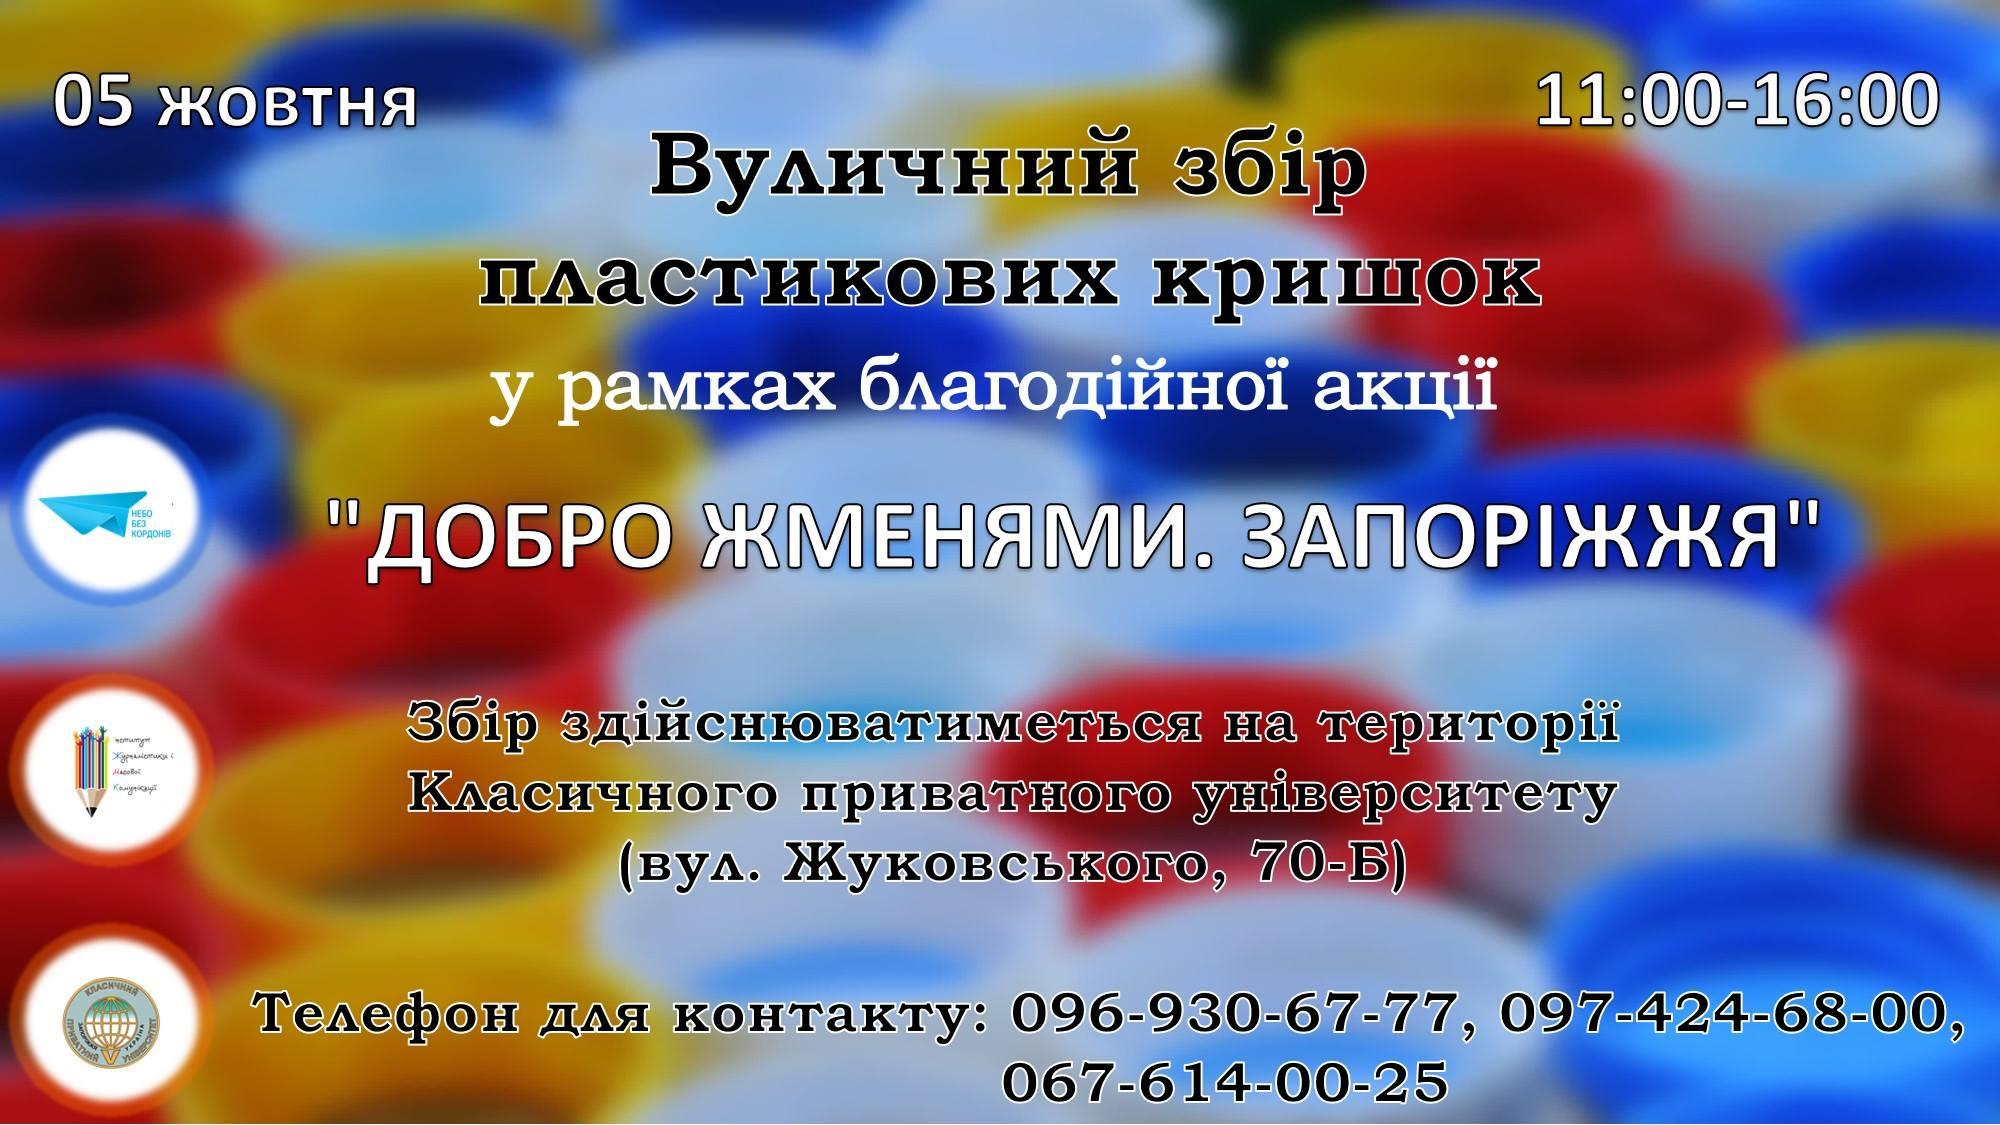 21587109_866603340174341_445938408671888161_o